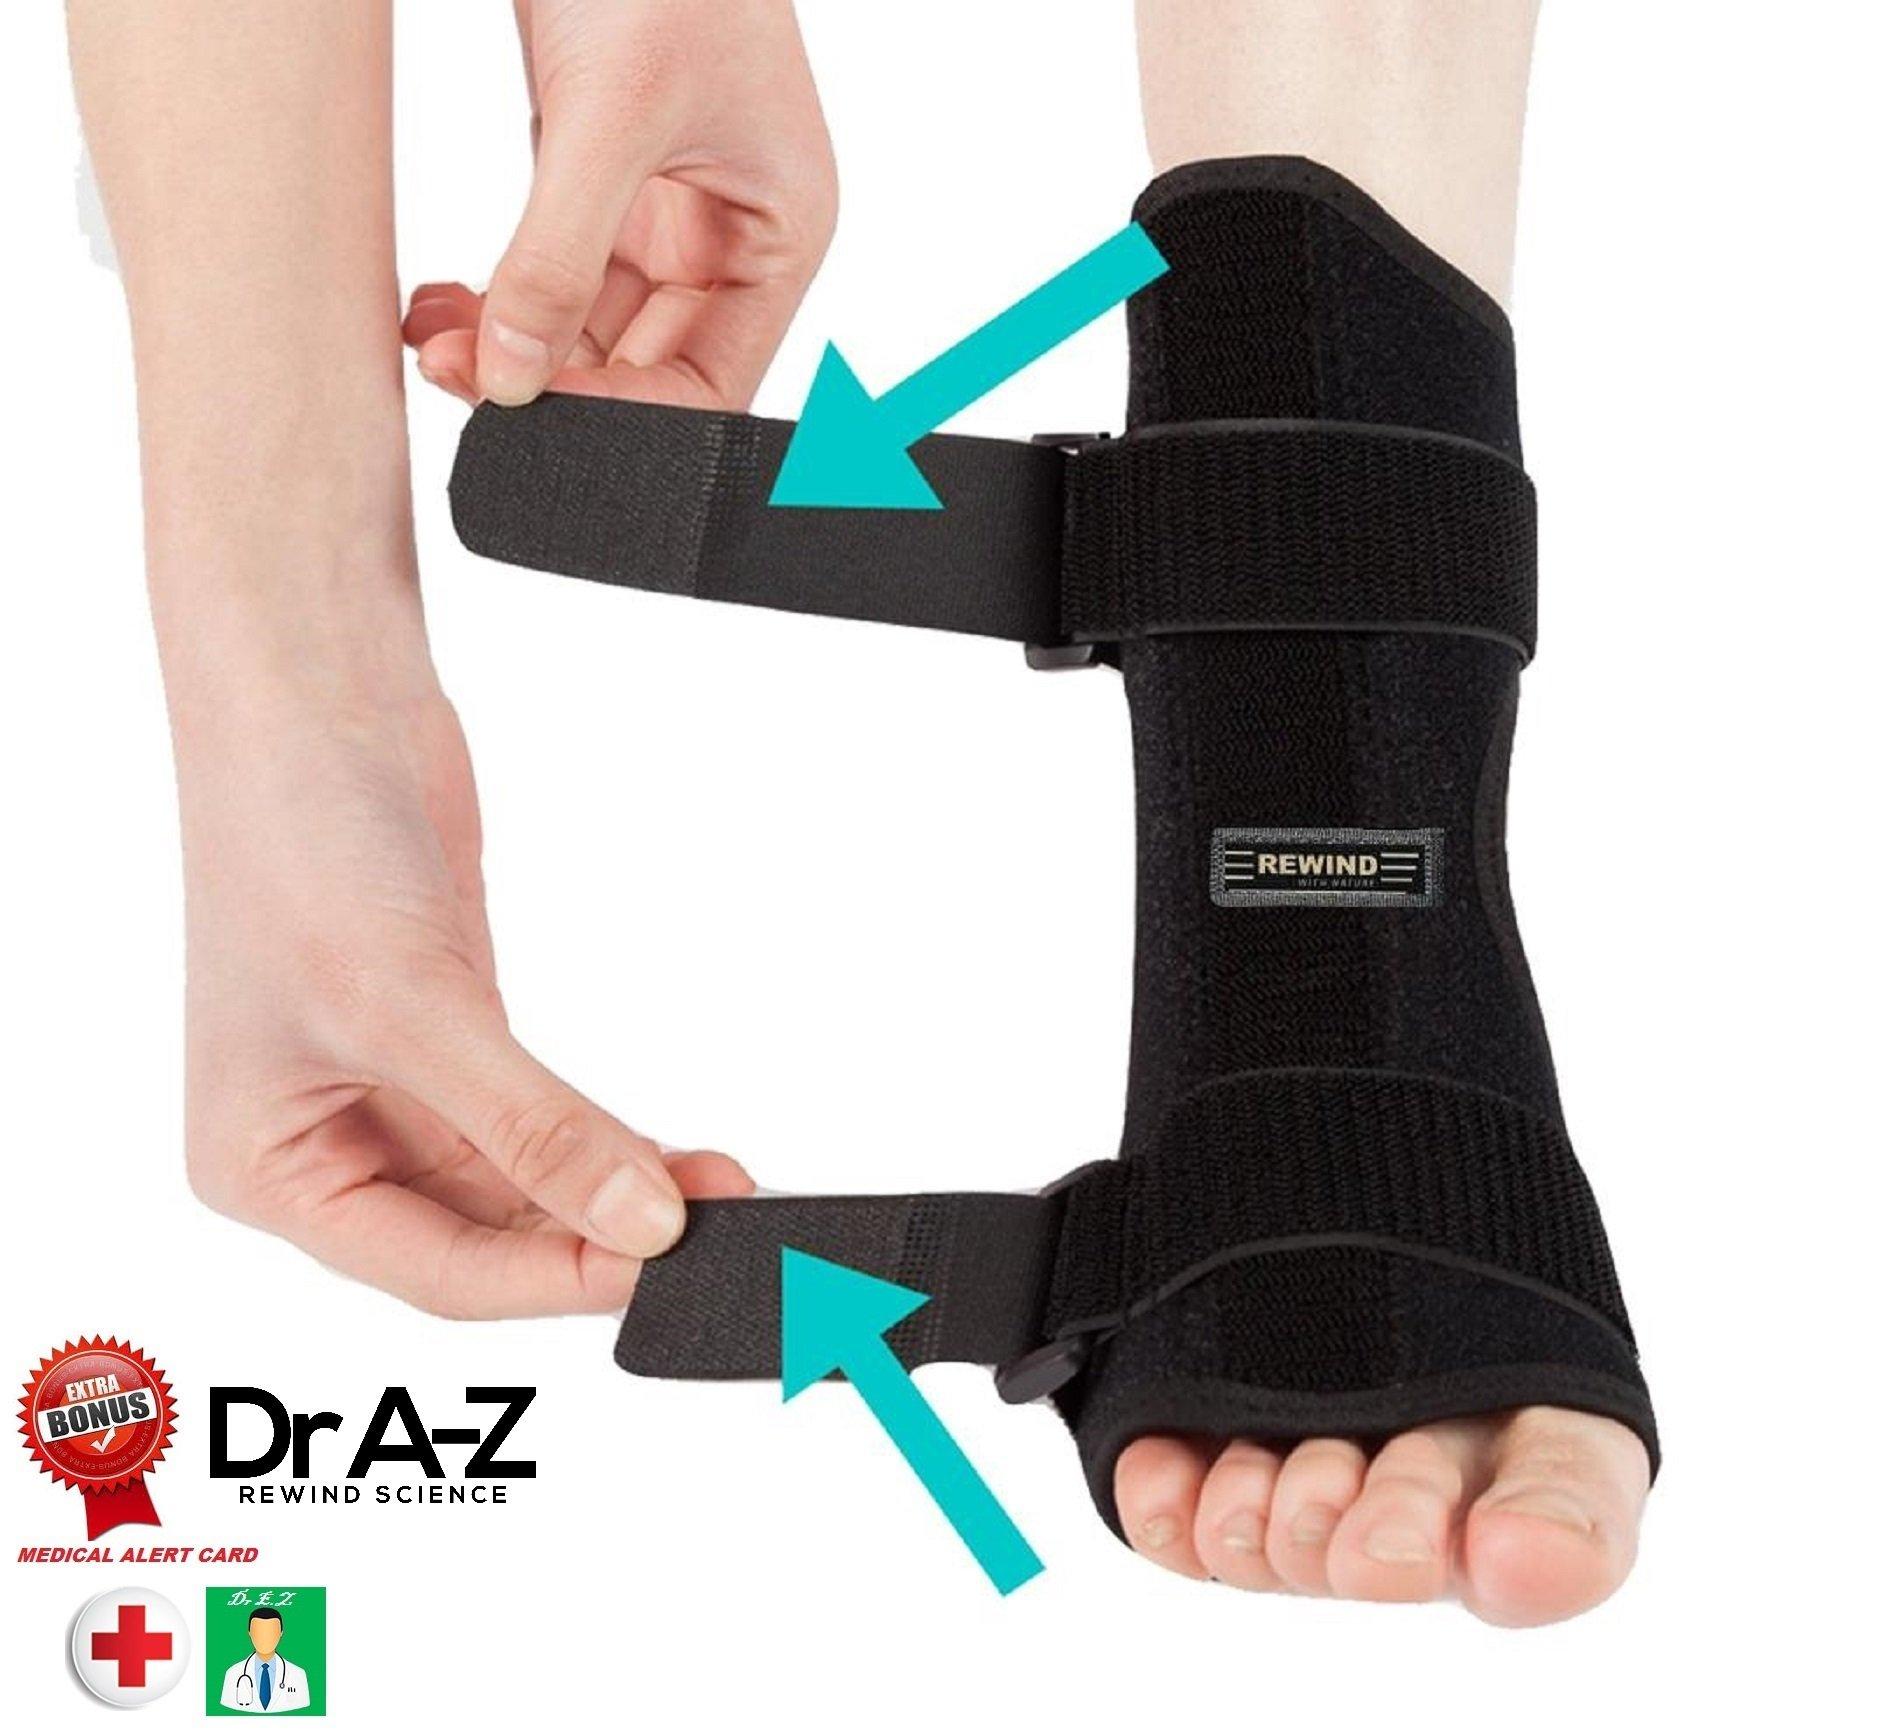 Dr A-Z Dorsal Night Splint Ankle Support Brace Plantar Fasciitis Feet Ankle Brace Arch Support Pain Relief Effective for Heel Arch Foot Pain, Achilles Tendonitis Bonus Alert Card